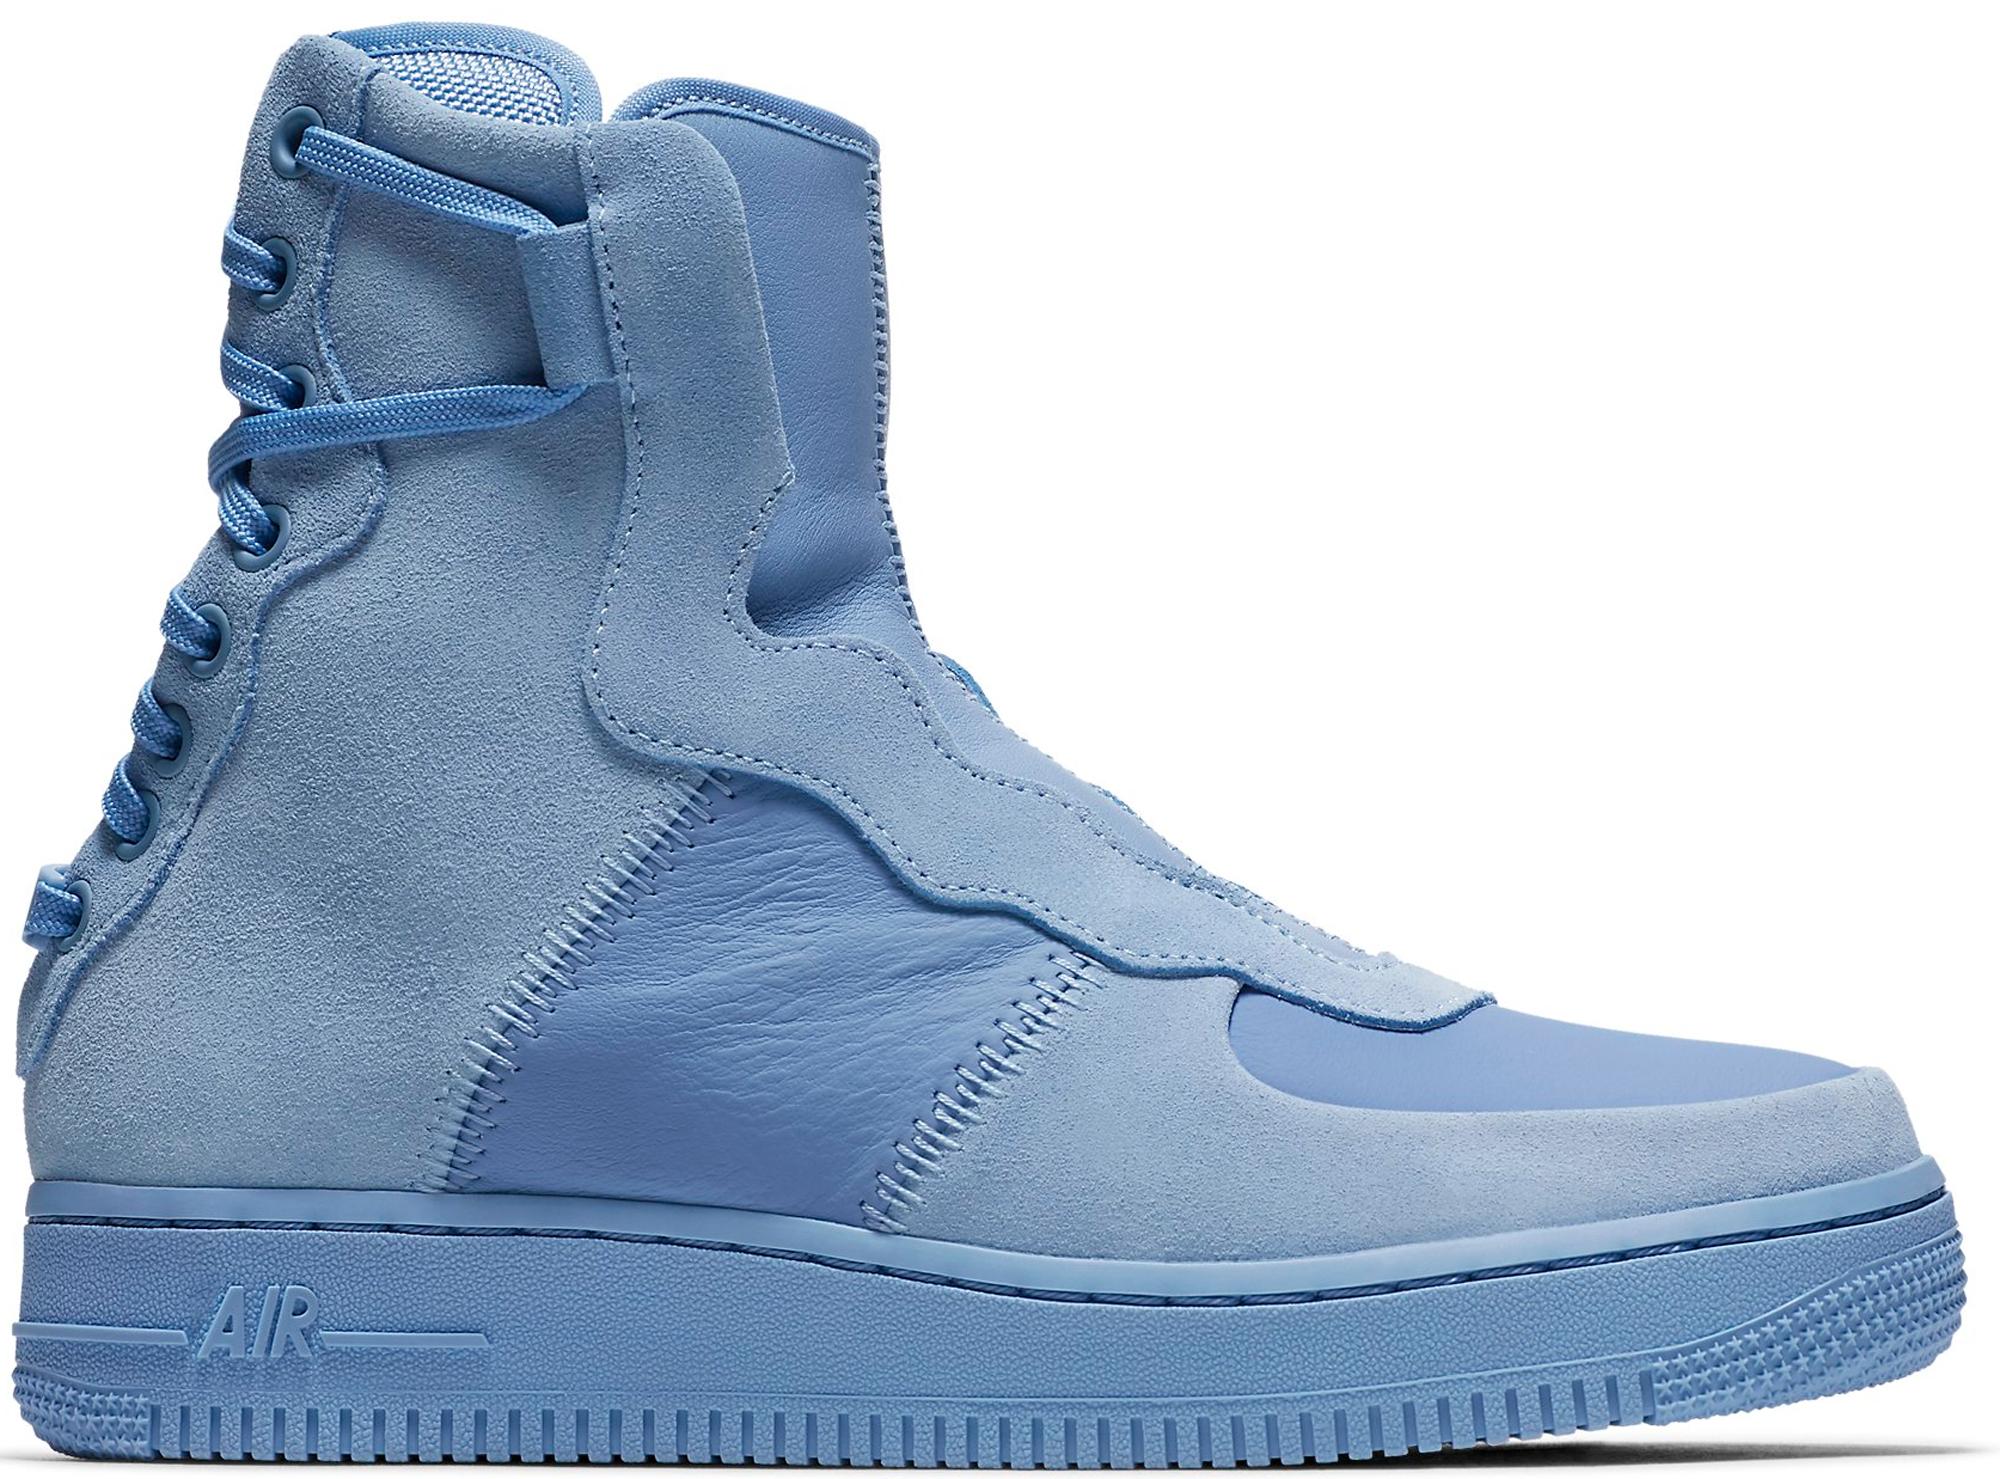 Nike Air Force 1 Rebel XX Light Blue (W